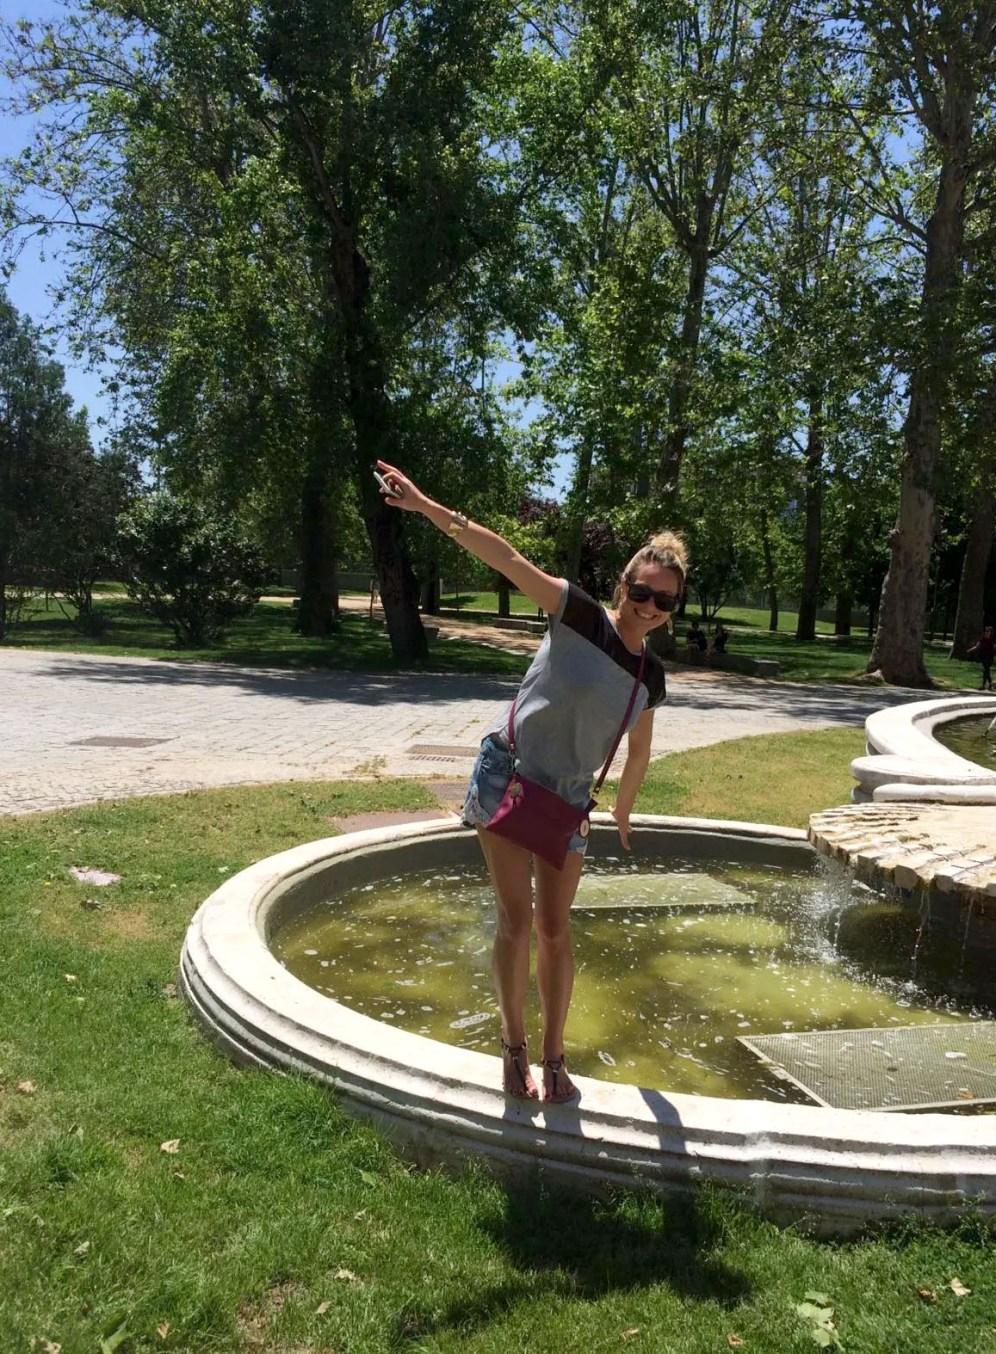 Madrid Sunshine Casa do Campo Walking Park Birthday Fountain Sound of Music